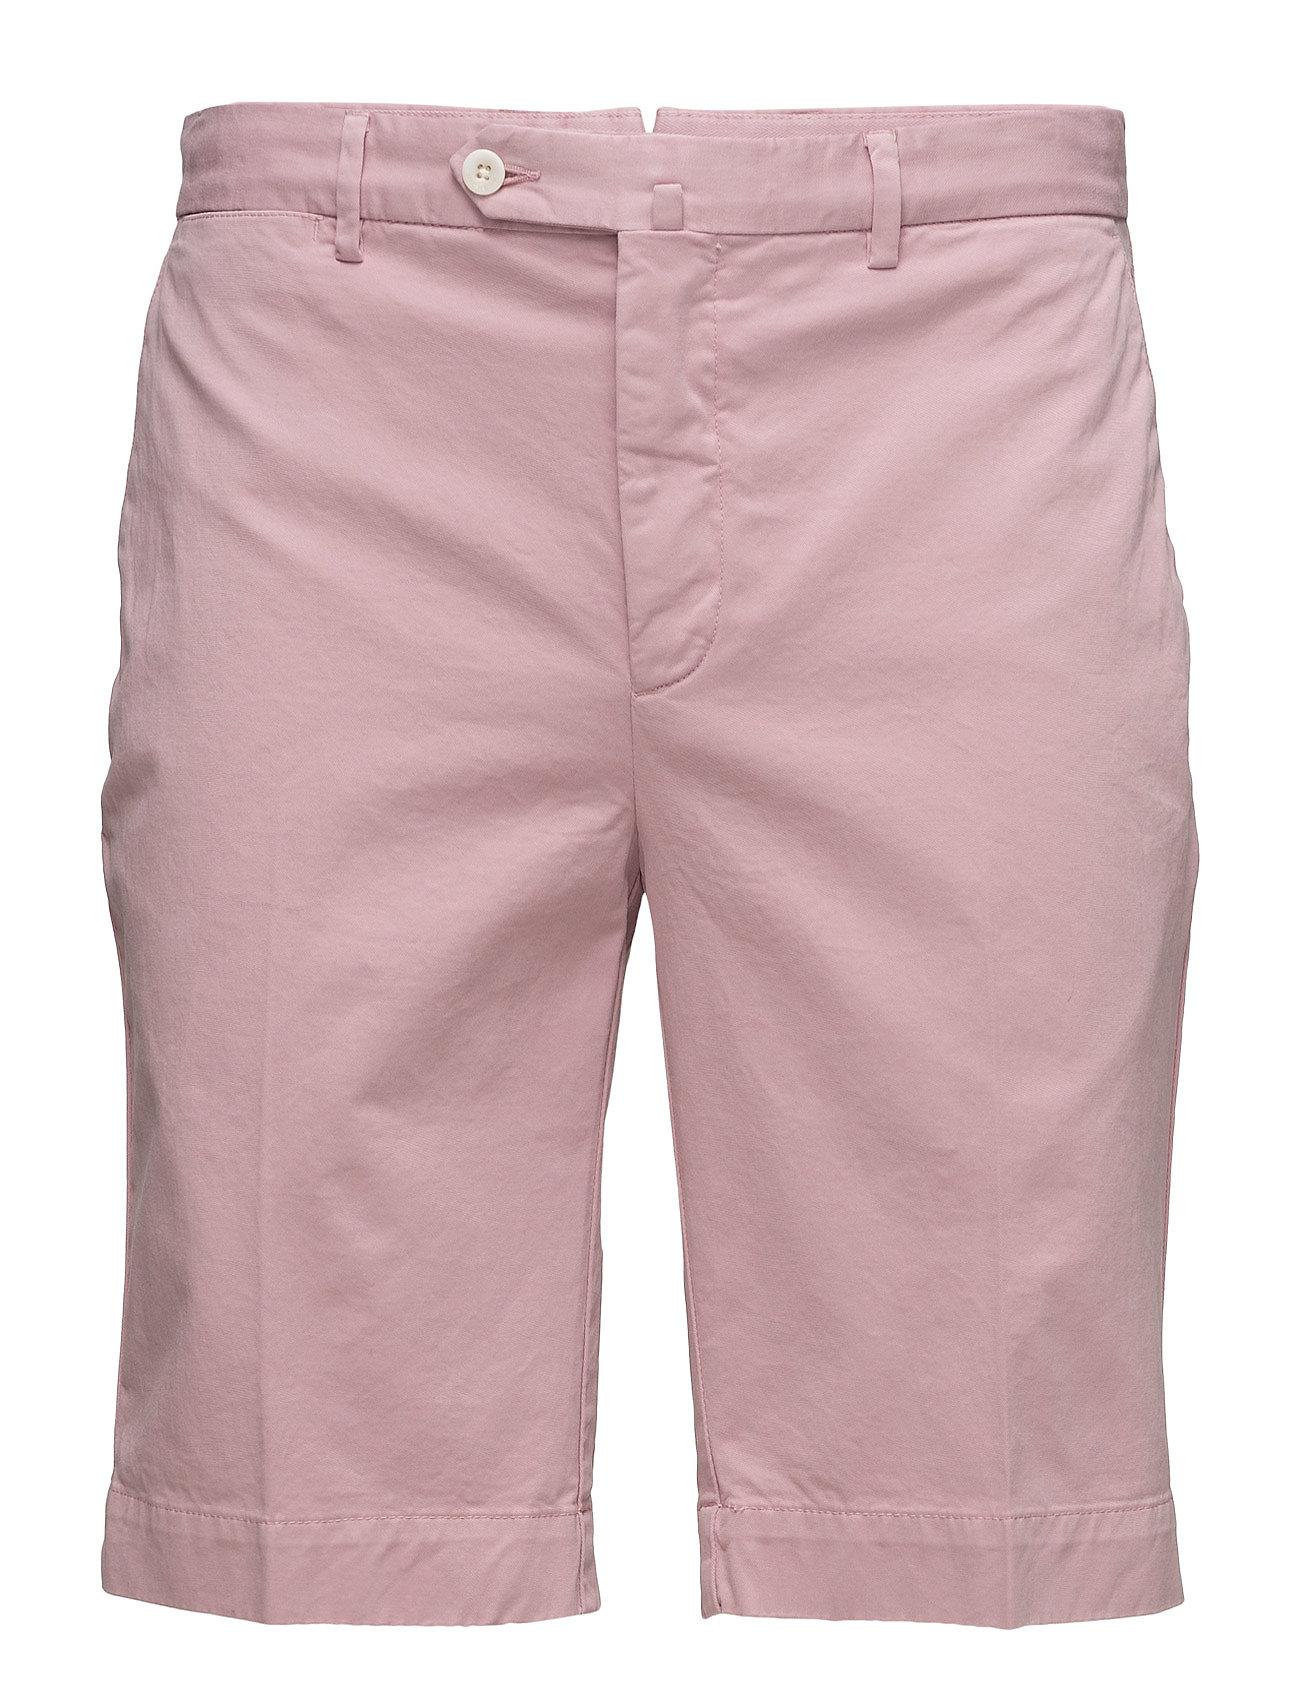 Core Stretch Shorts Hackett Bermuda shorts til Herrer i Ash Rose